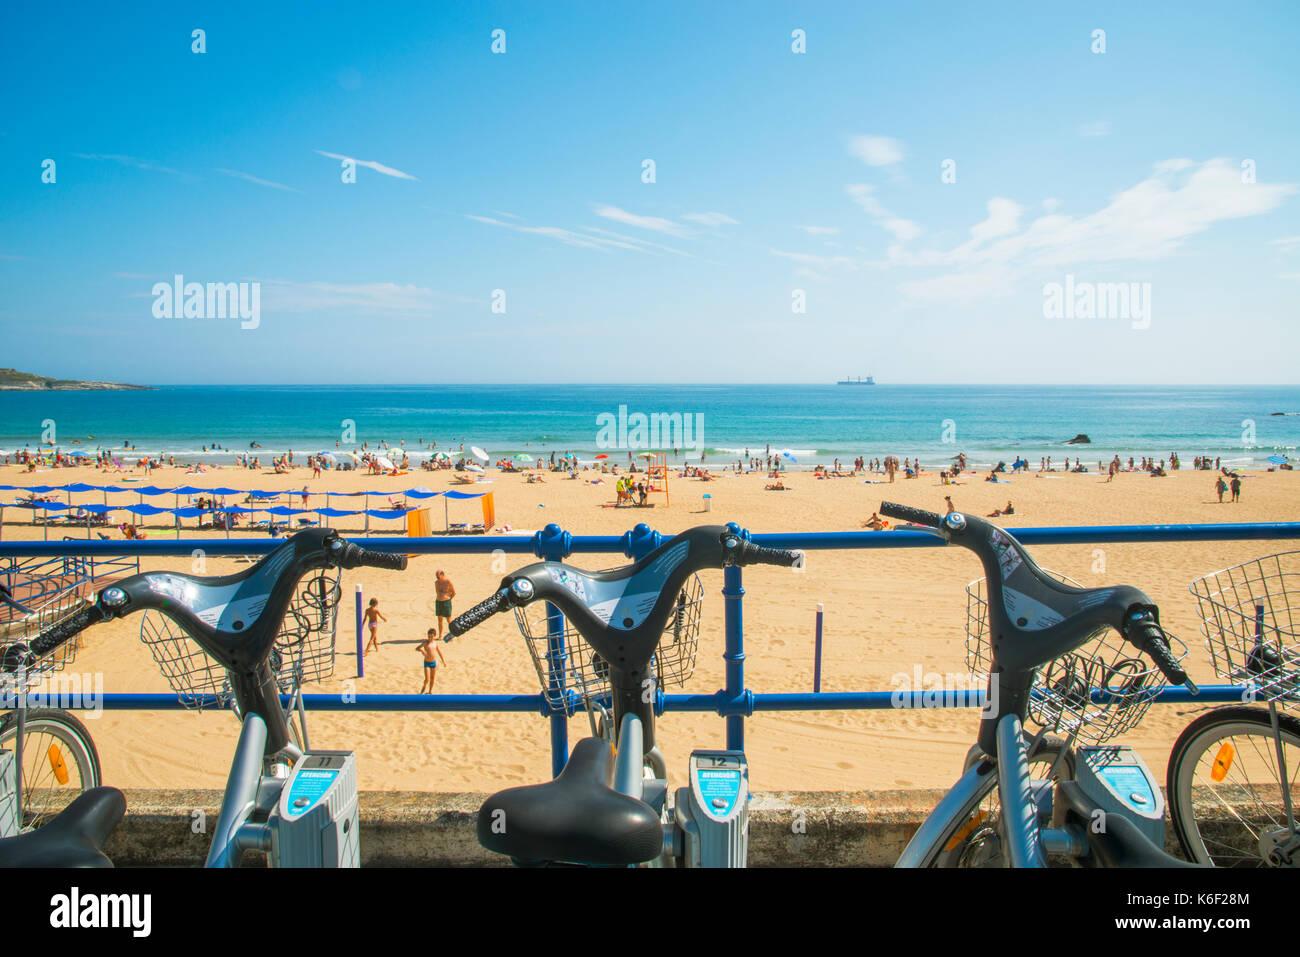 Bike parking and Sardinero beach. Santander, Spain. - Stock Image